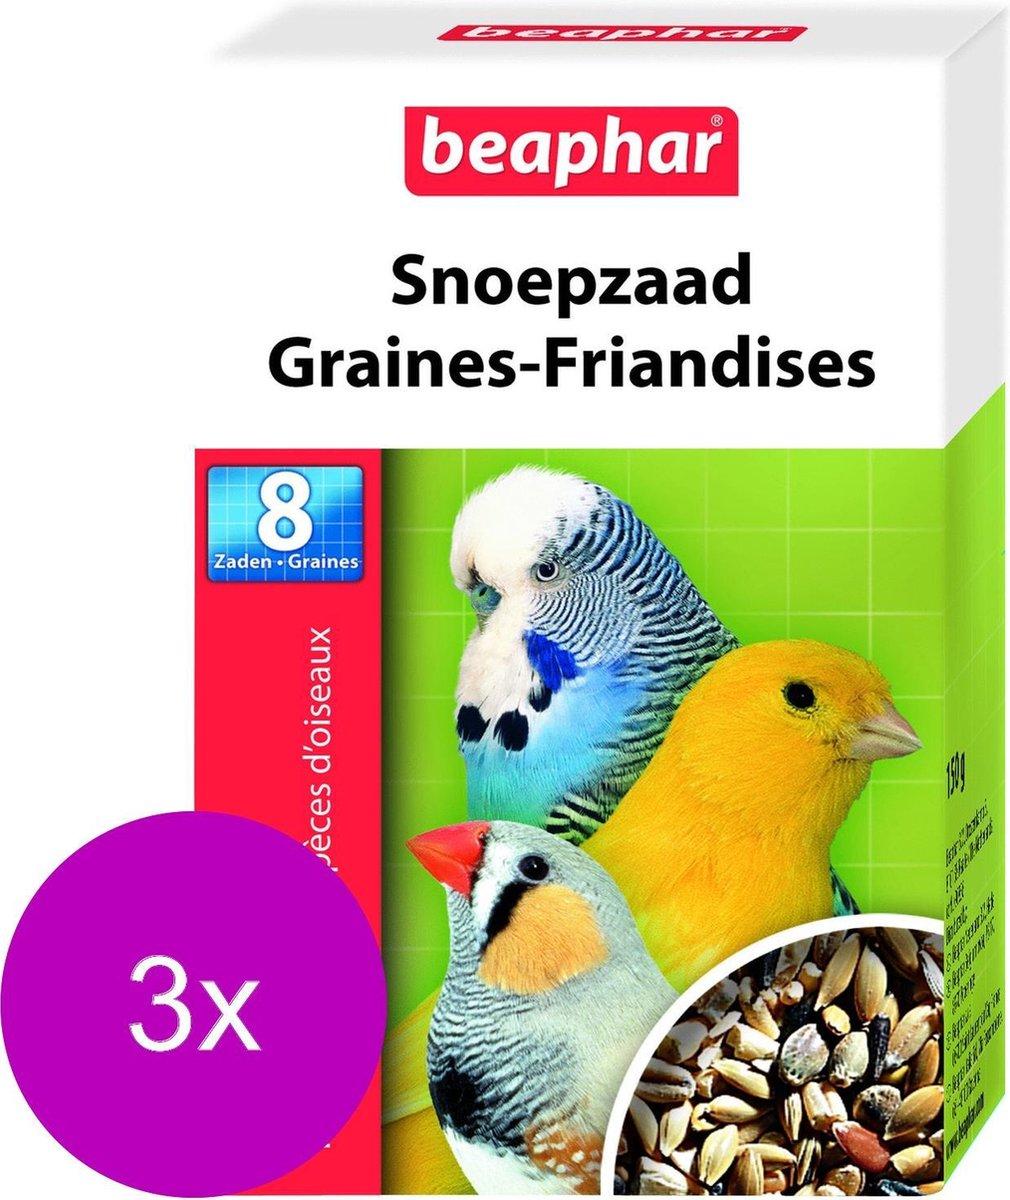 Beaphar Snoepzaad - 3 a 150 gr - Vogelsnack